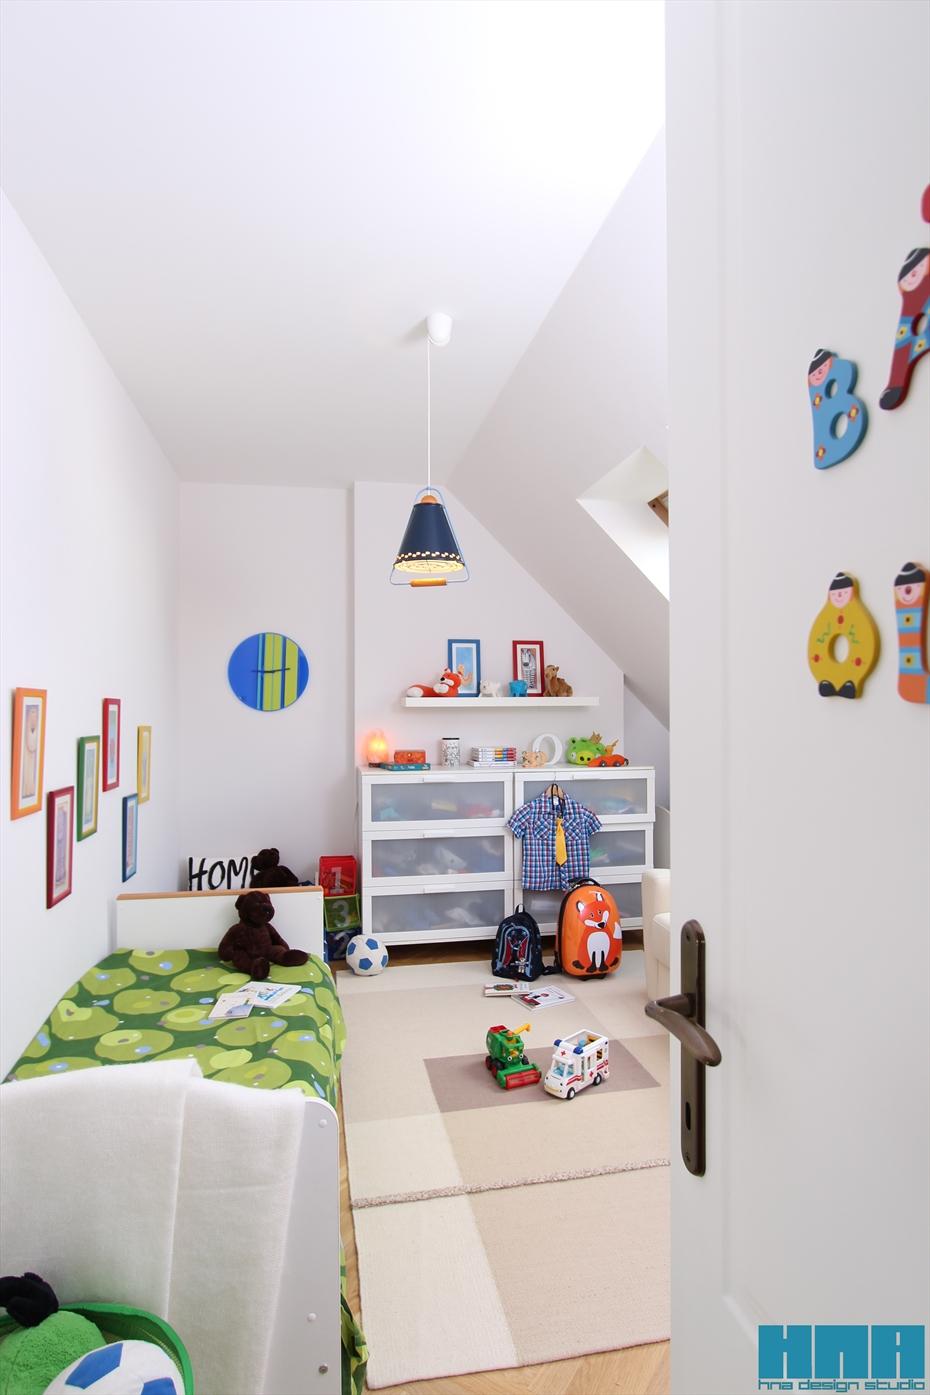 hna design pd foto 45